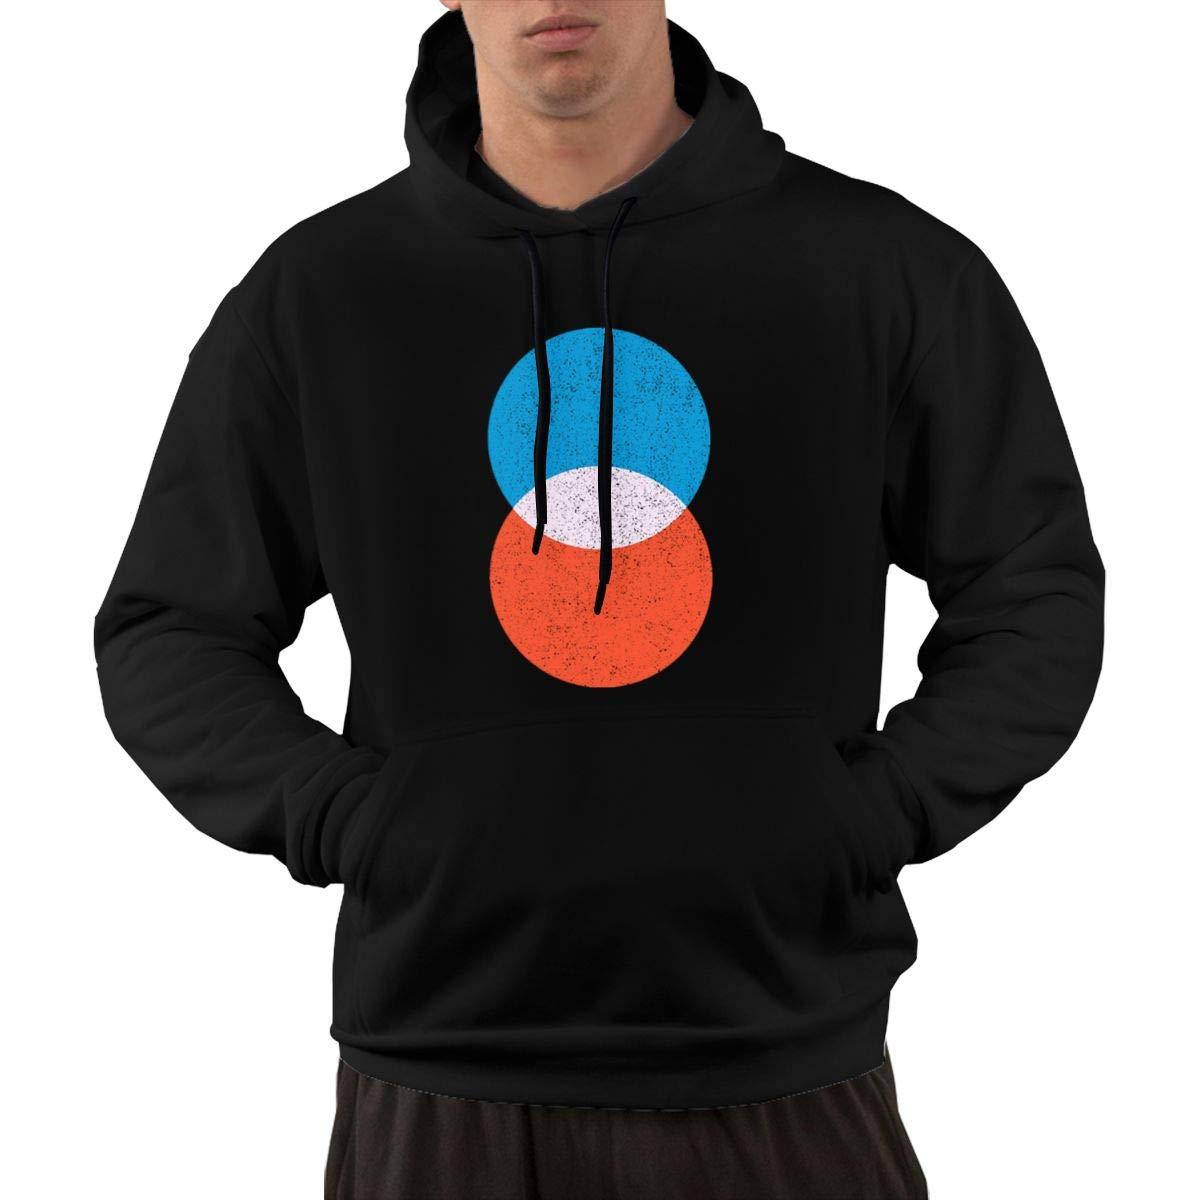 Circles Interception Hoodie Long Sleeve Sweatshirts with Plus Size